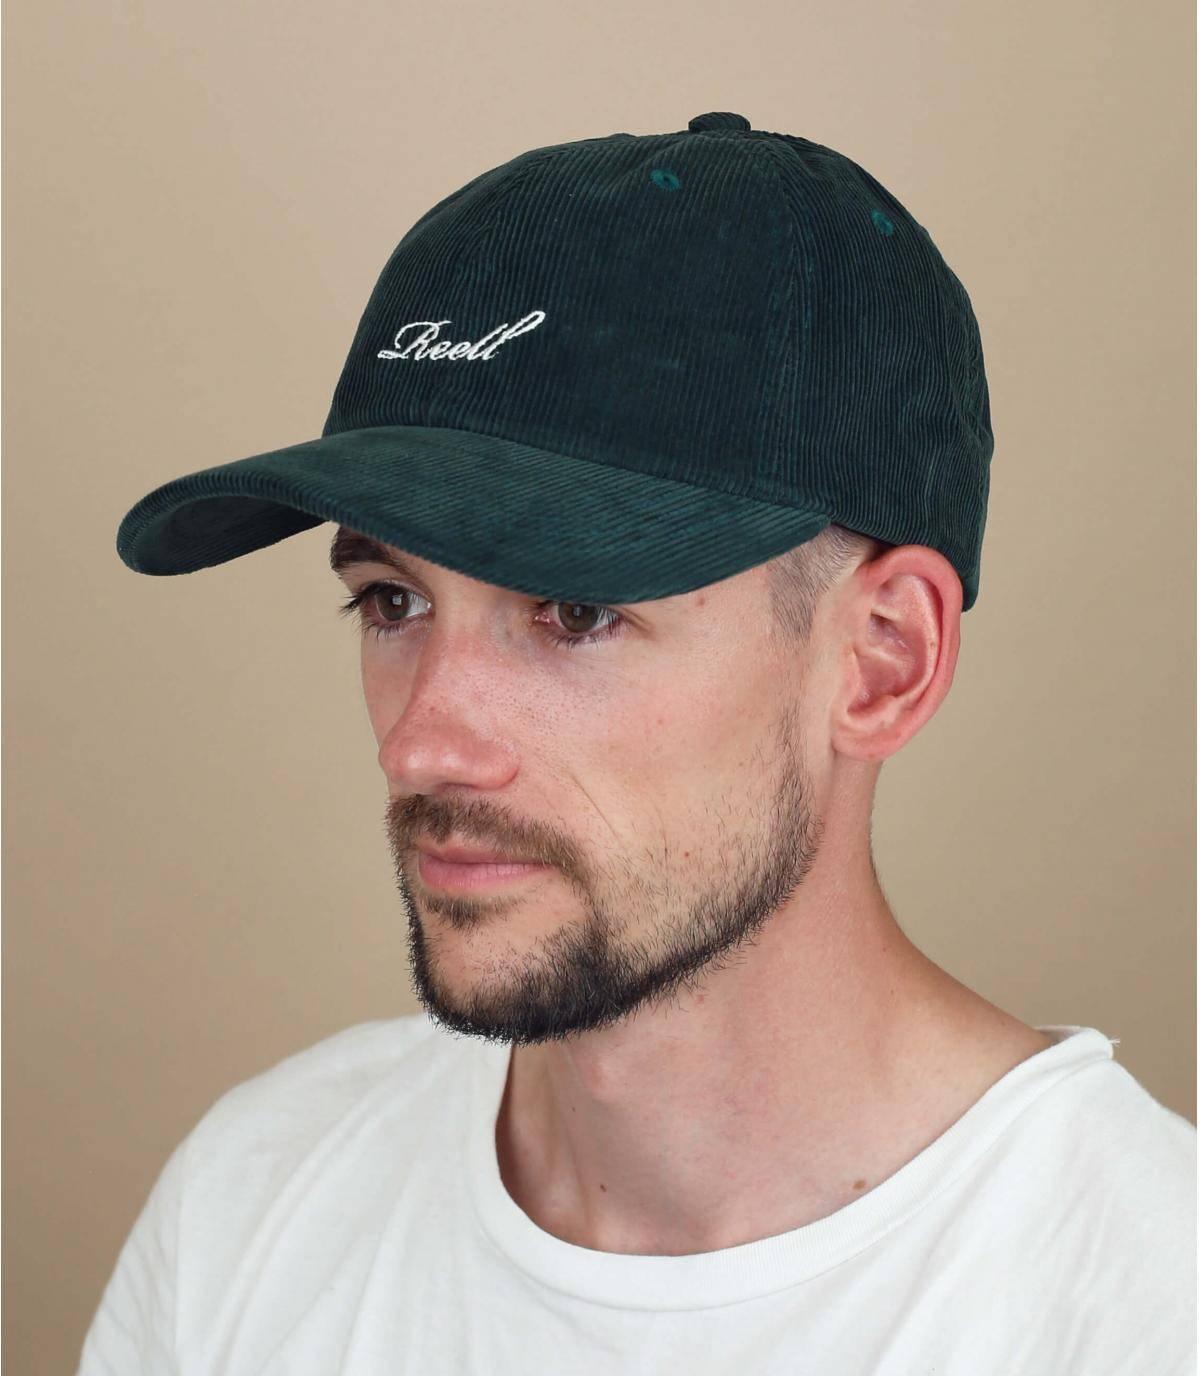 Groene fluwelen Reell cap